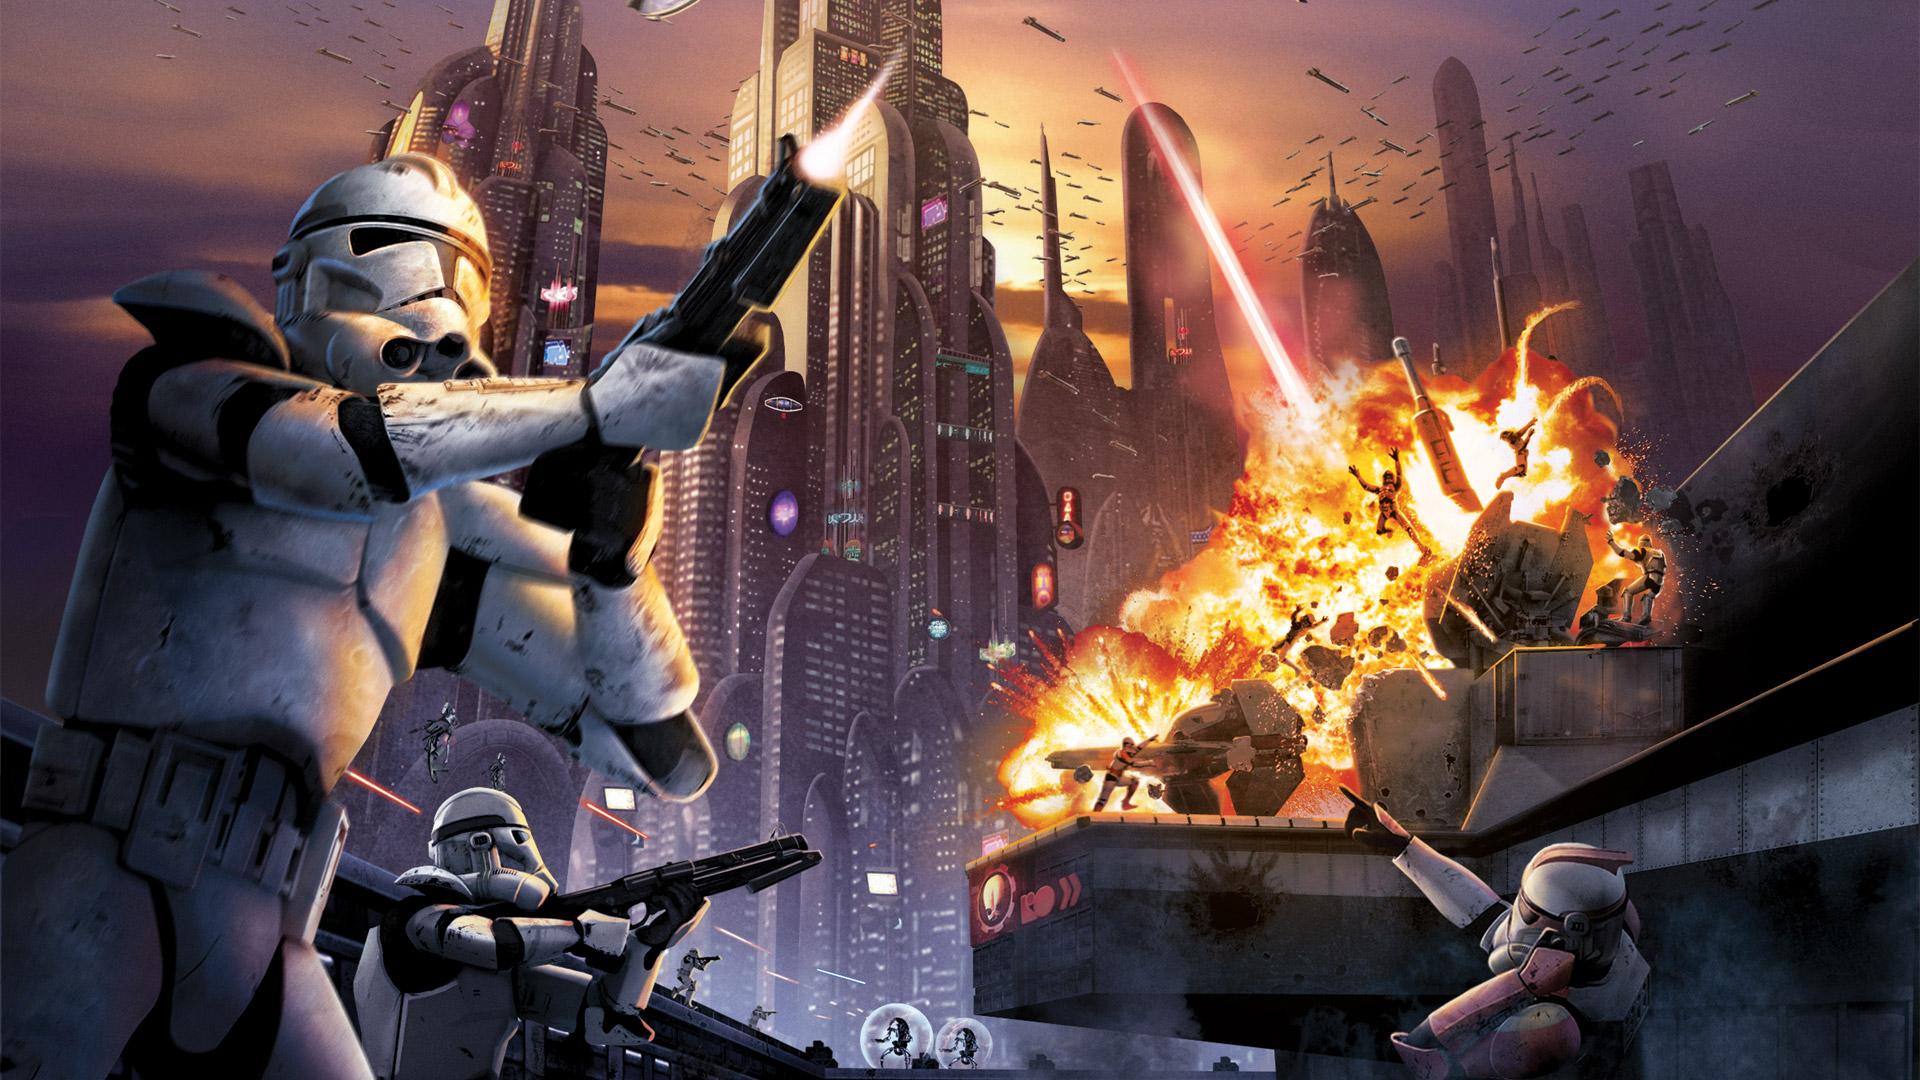 Free Star Wars Battlefront: Elite Squadron Wallpaper in 1920x1080